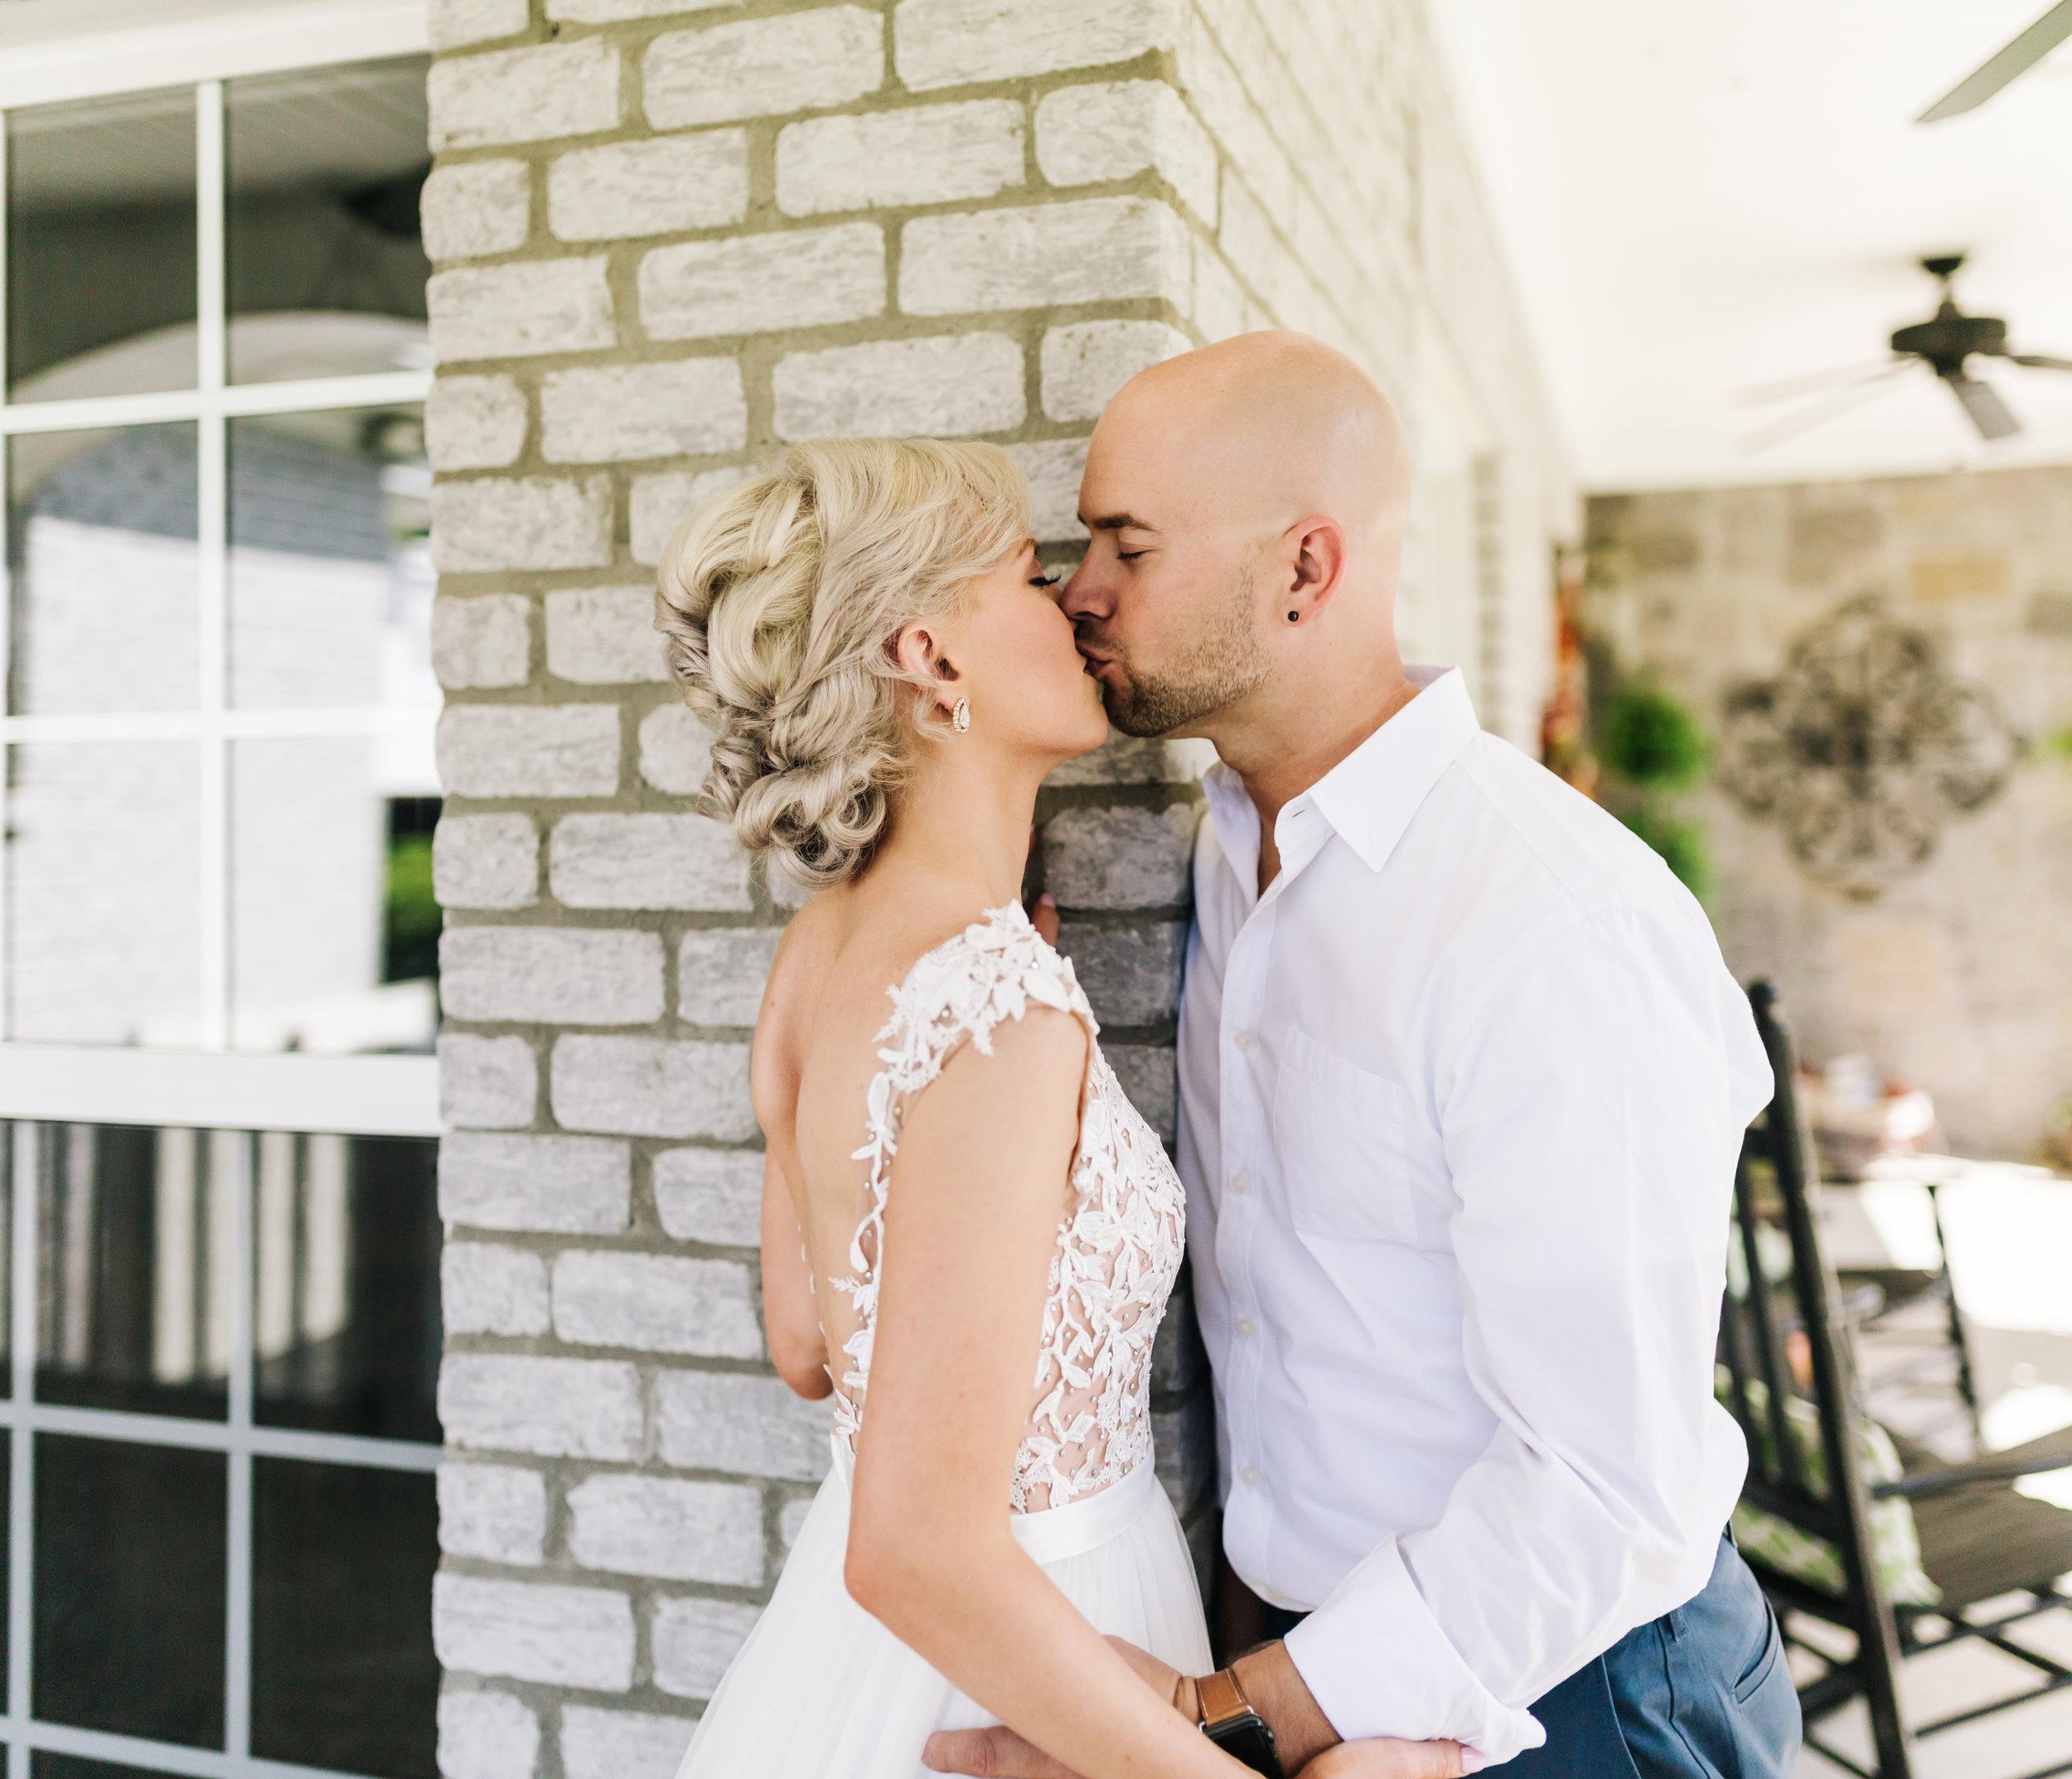 2018.09.02 Ray and Sarah Prizner Nashville TN Wedding FINALS-130.jpg